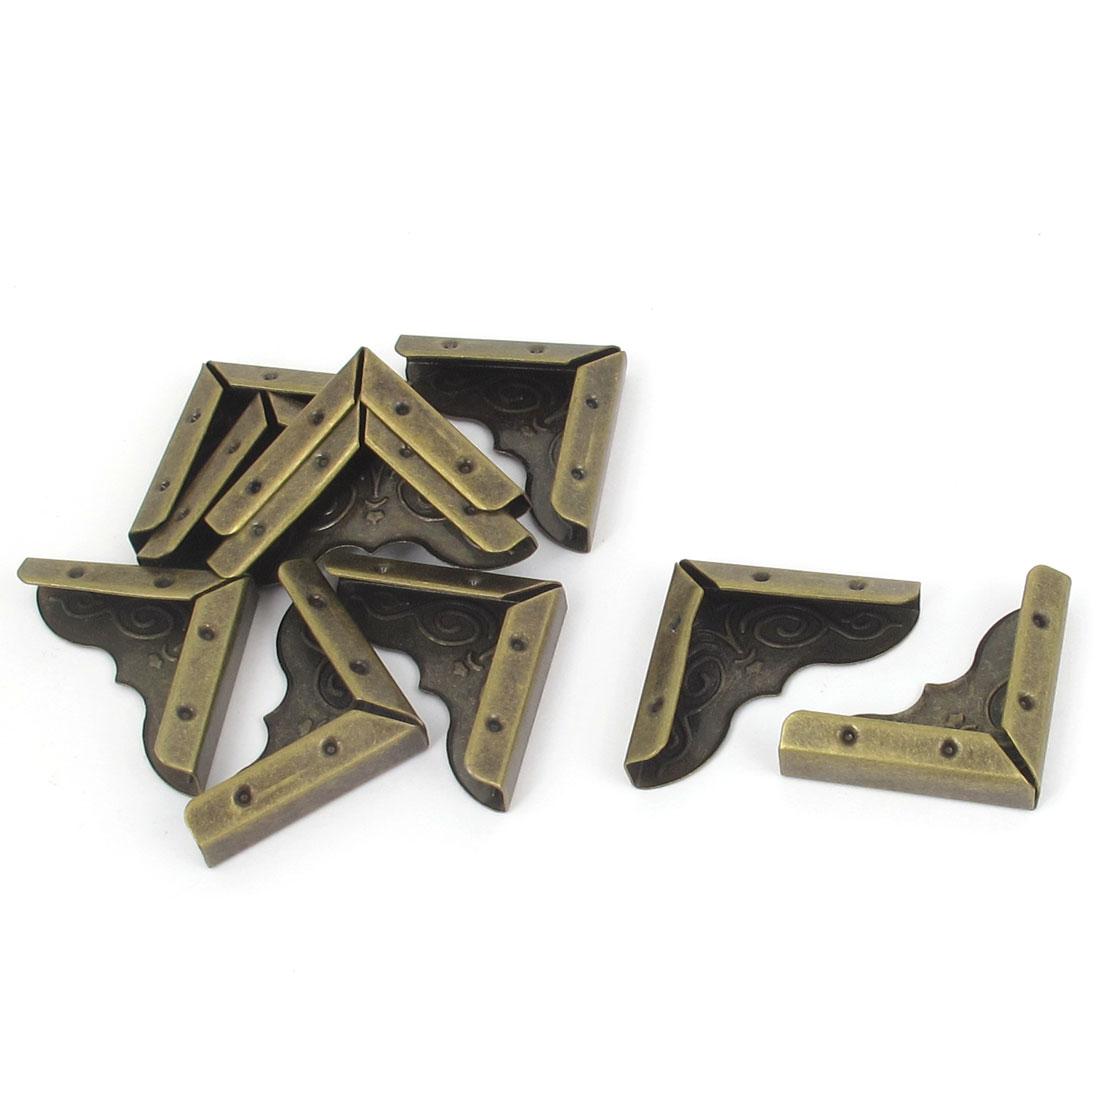 Vintage Style Flower Brim Metal Angle Bracket Braces Bronze Tone 10pcs